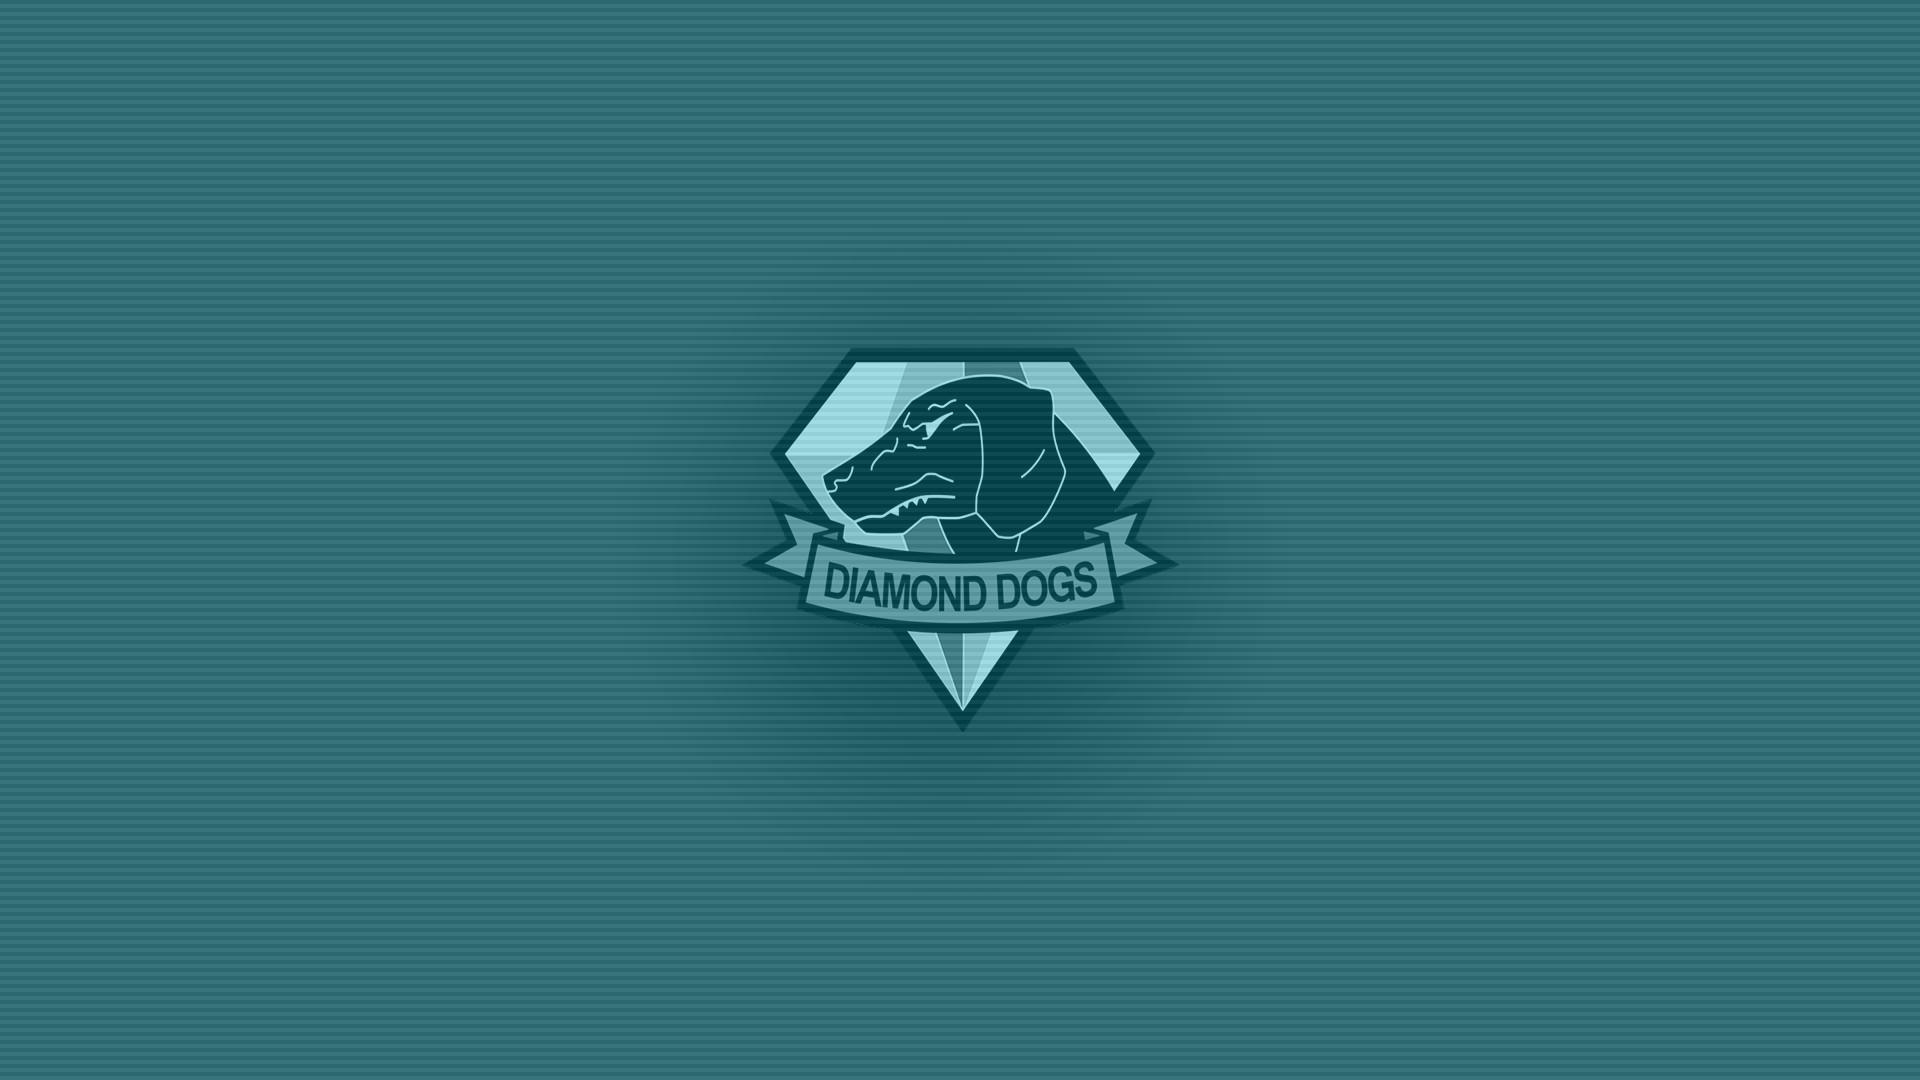 Simple Diamond Dogs Wallpaper (OC) [1920×1080] #MetalGearSolid #mgs #MGSV